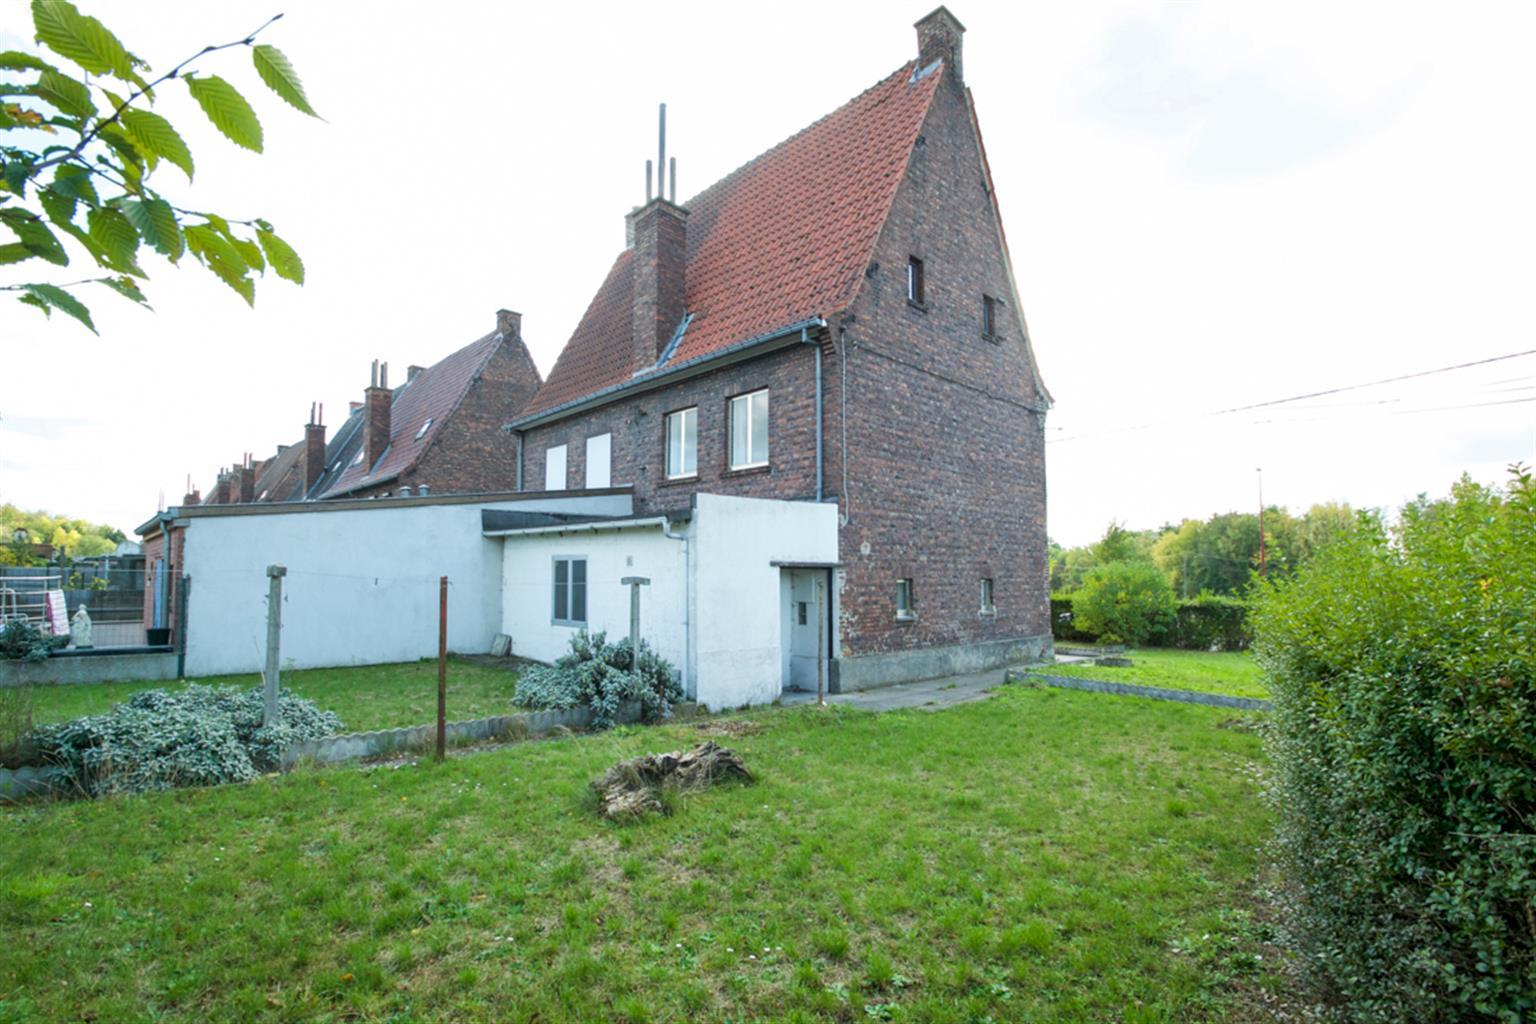 Maison - Binche Péronnes-lez-Binche - #3205615-6